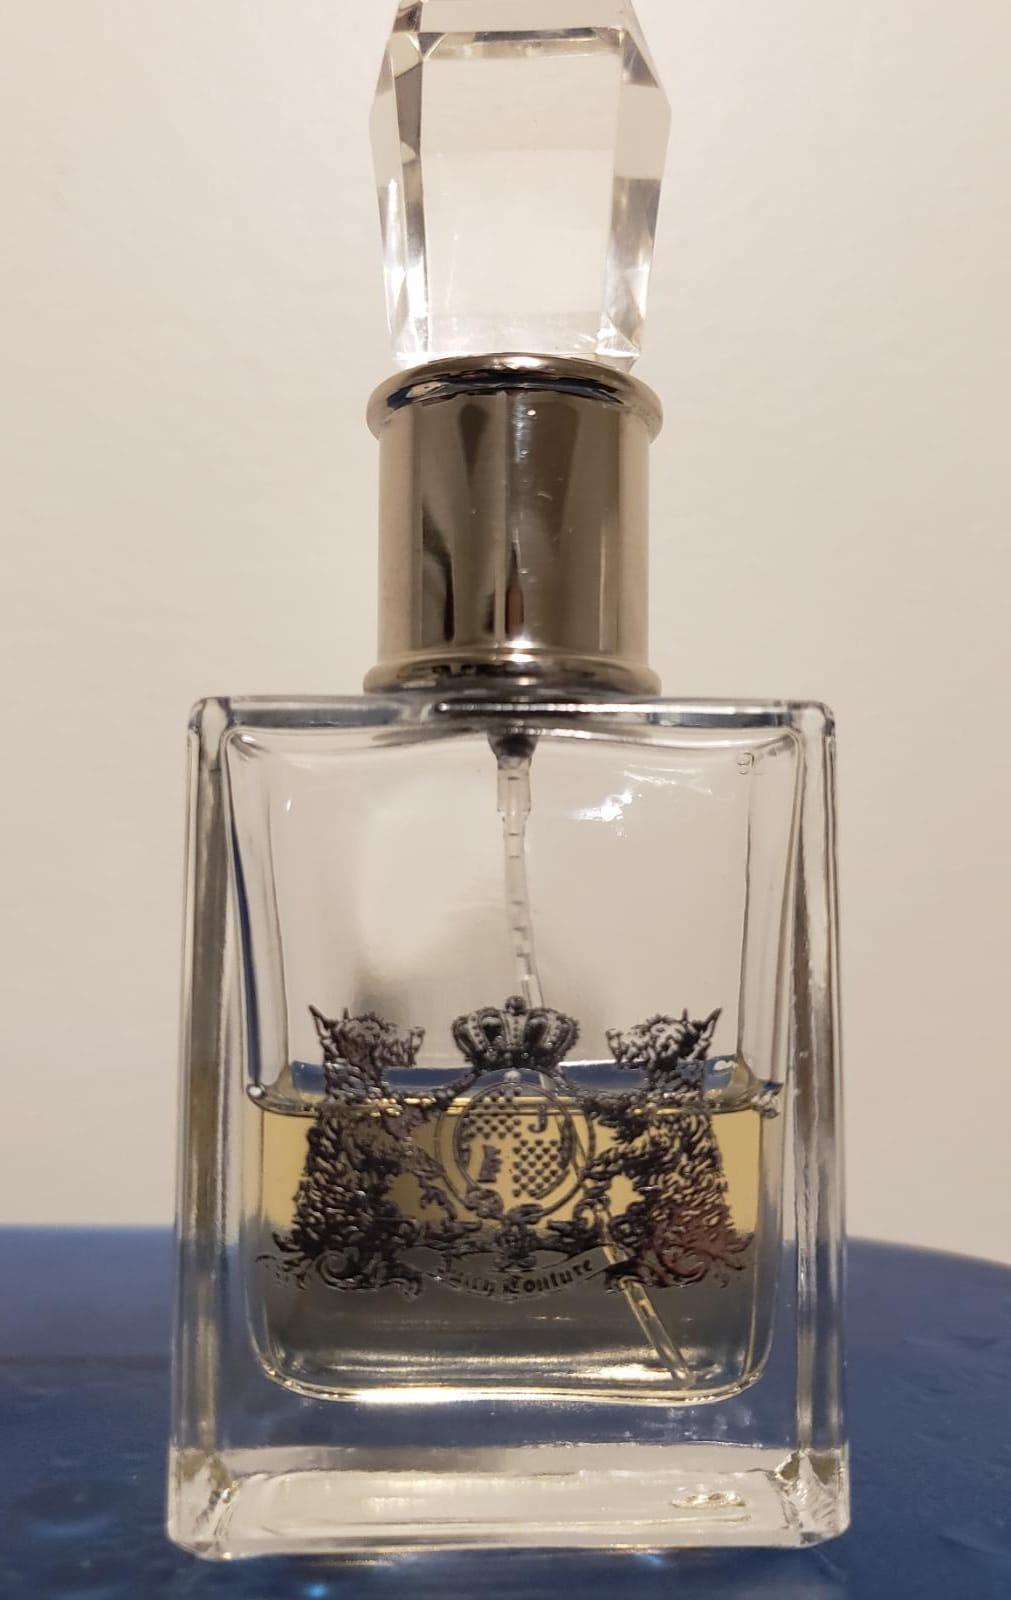 Juicy Couture Viva La Juicy Eau De Parfum-Fruity, Juicy, Sensual fragrance!-By poonam_kakkar-2